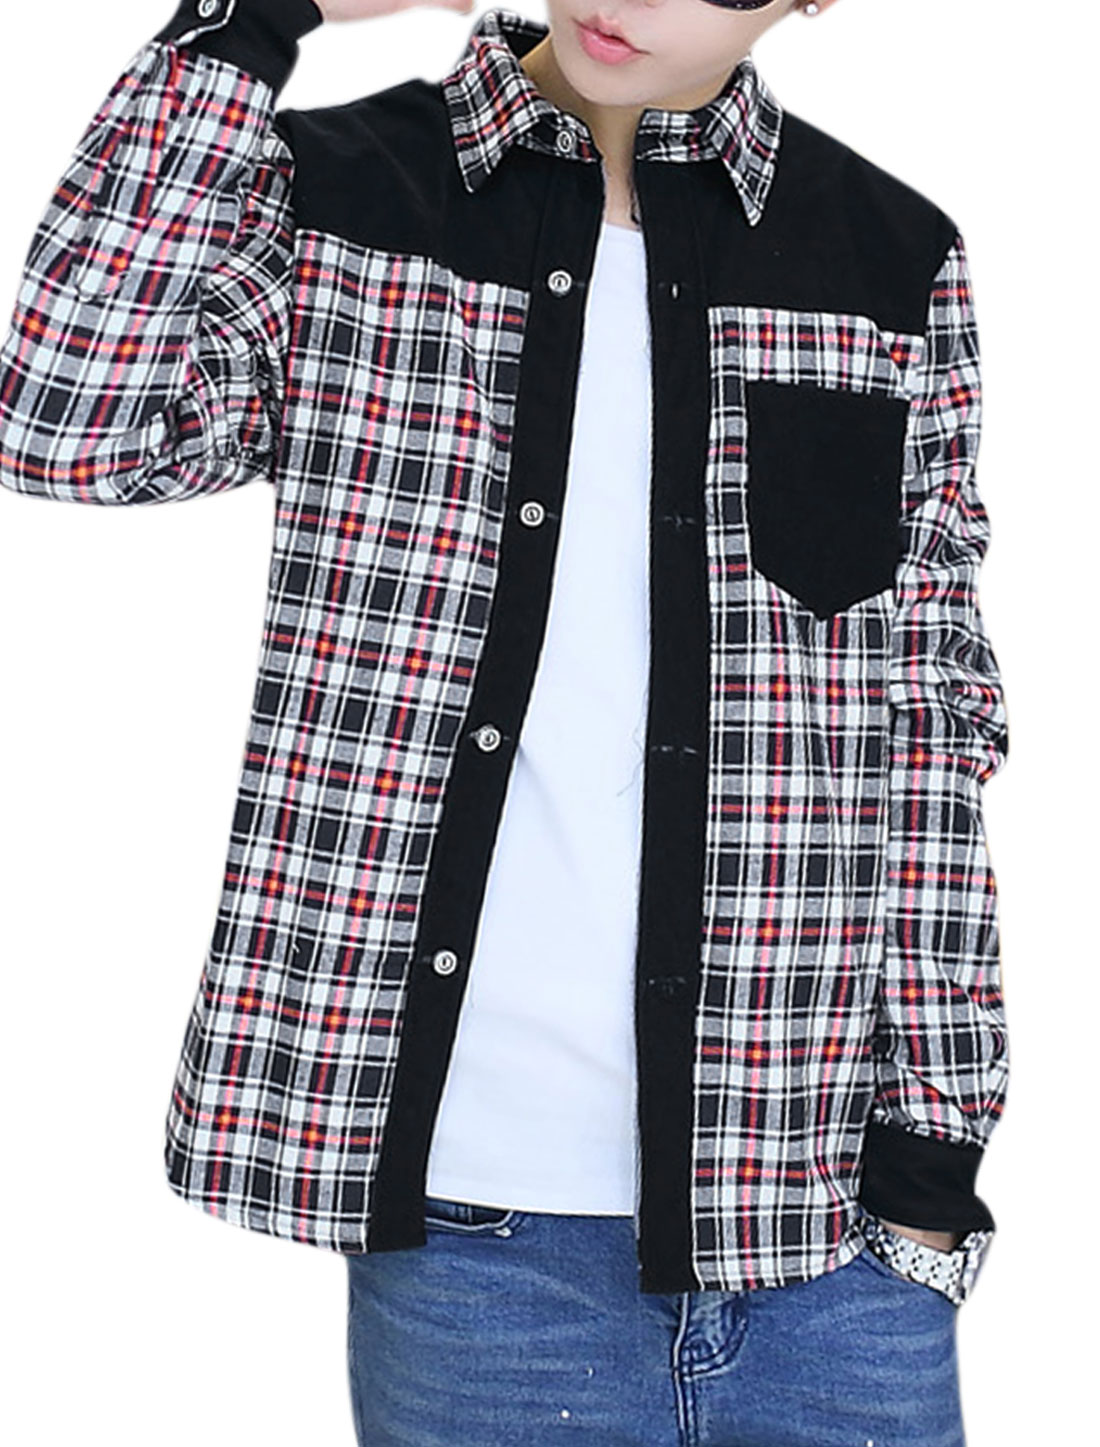 Men Checkered Pattern Long Sleeves Fleece Lining Shirt Red White M